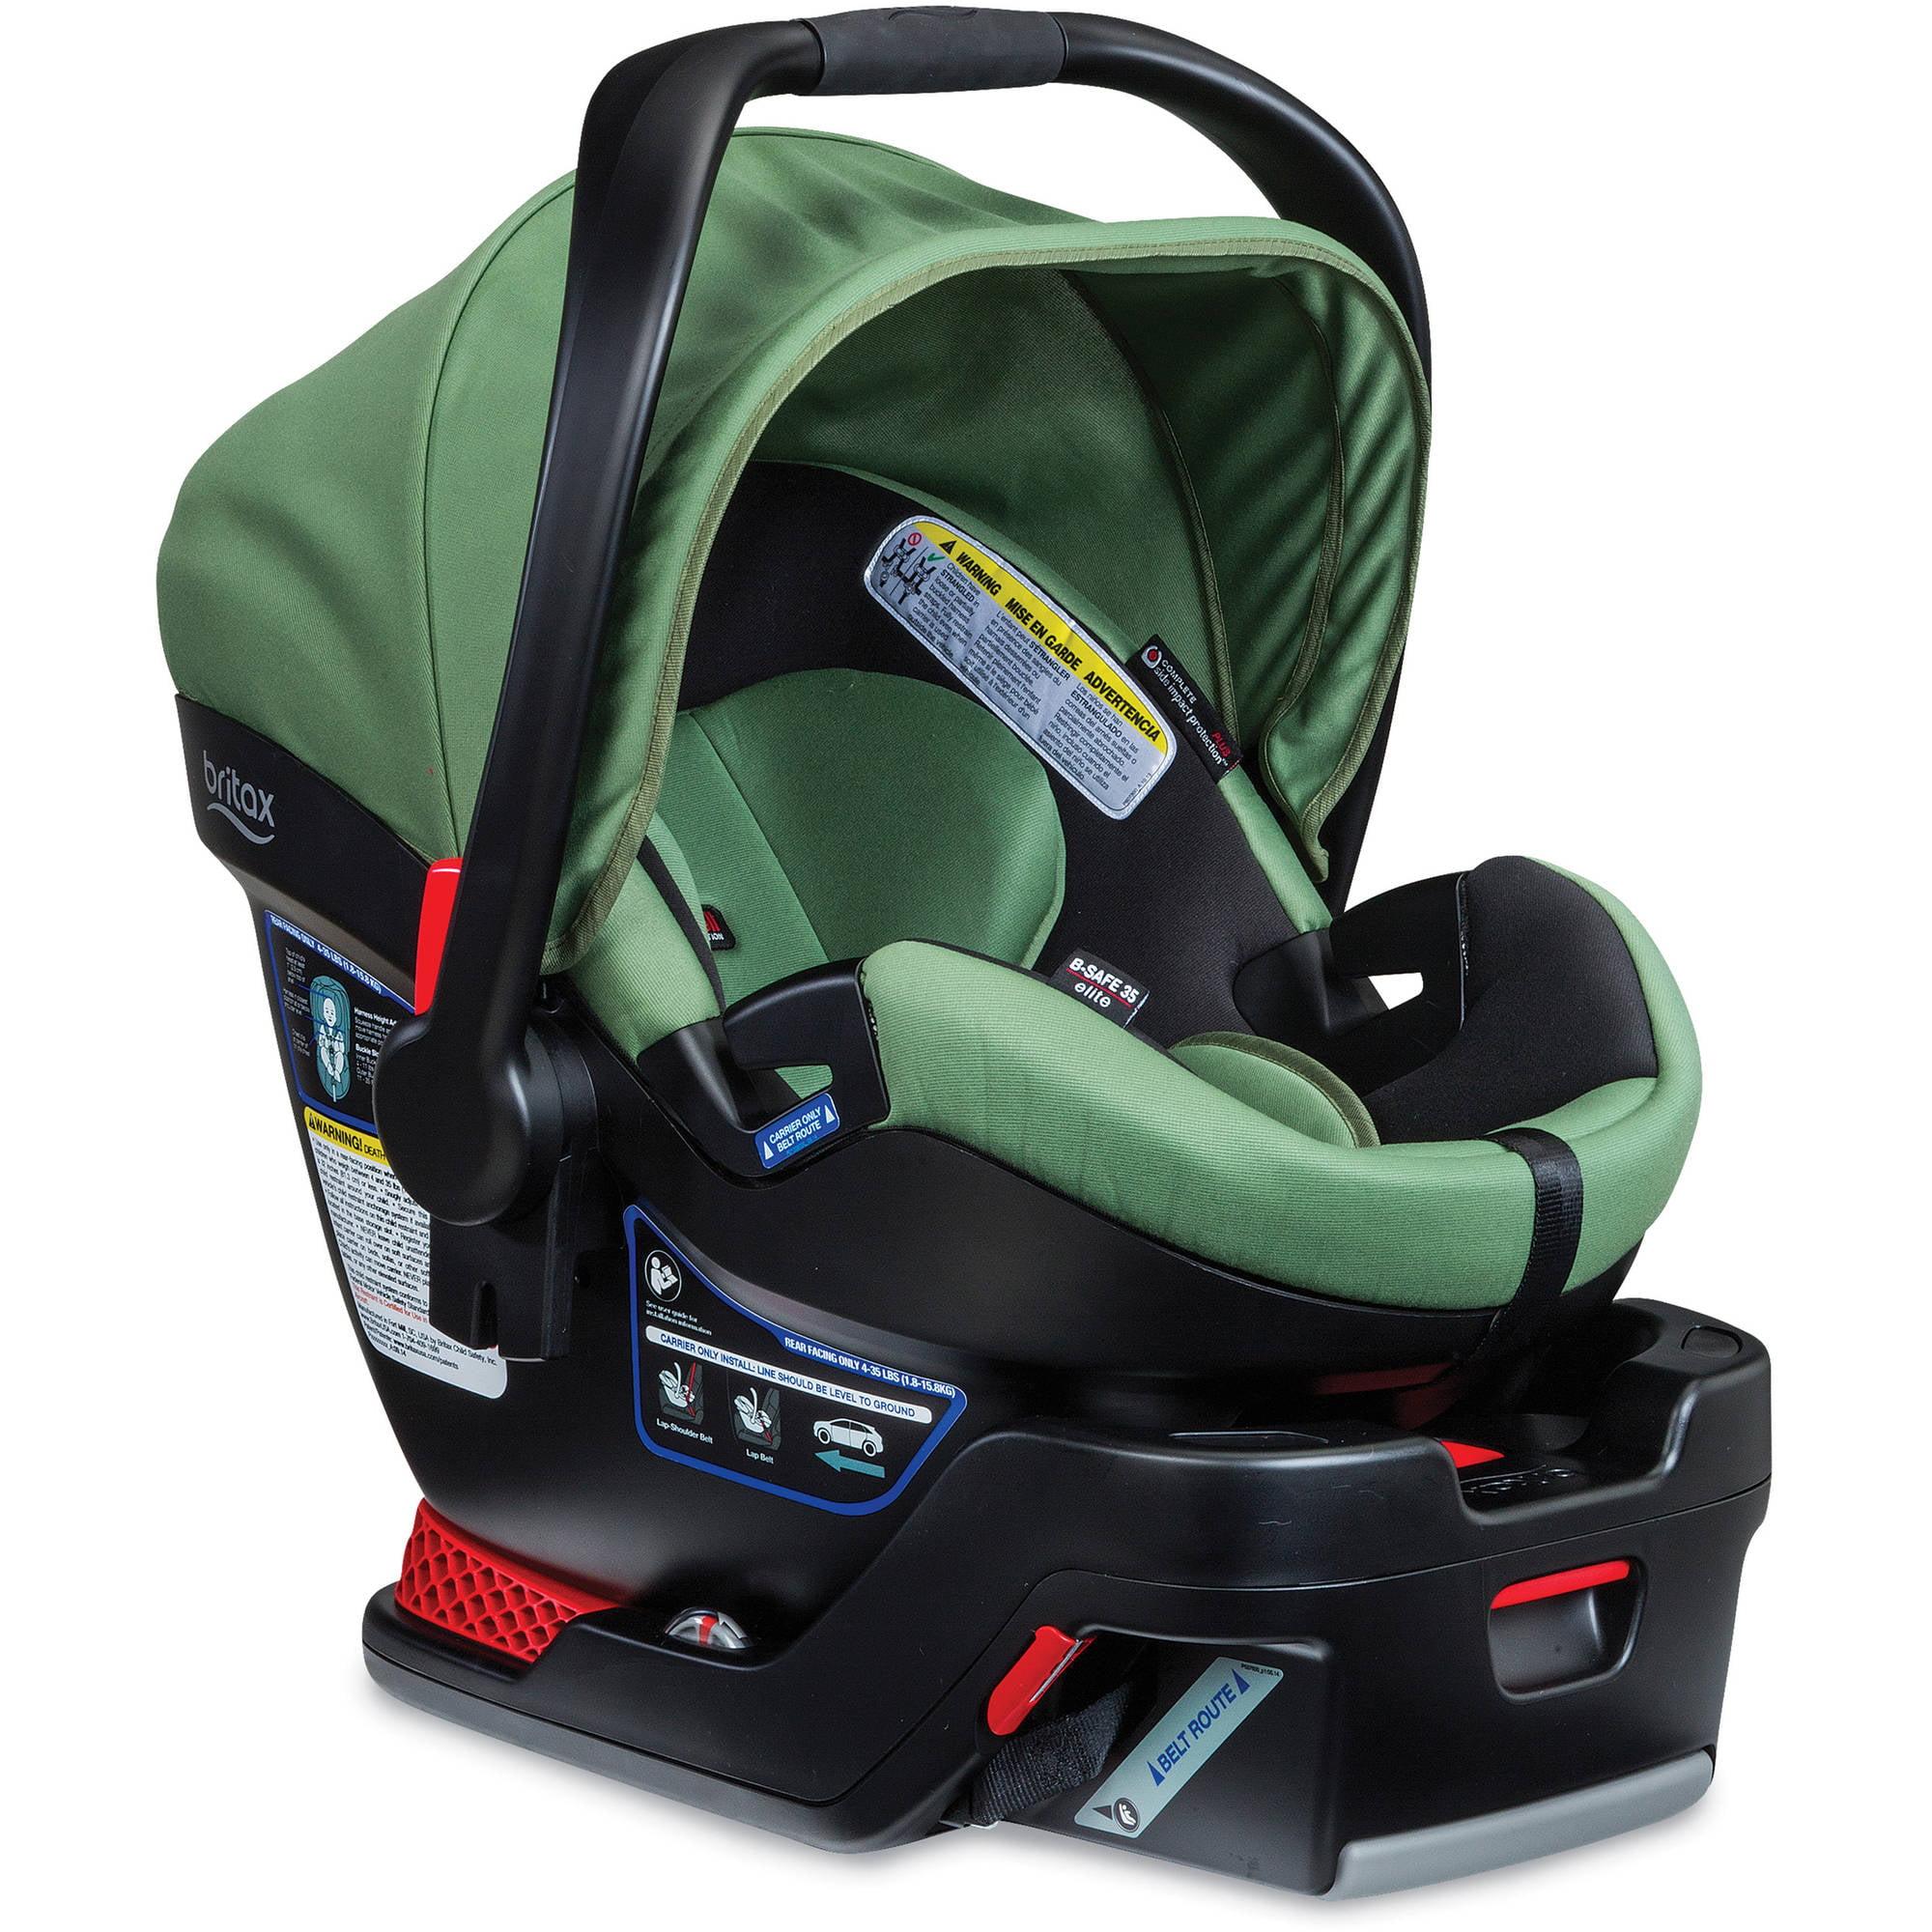 Britax B-SAFE 35 Elite Infant Car Seat, Choose Your Color